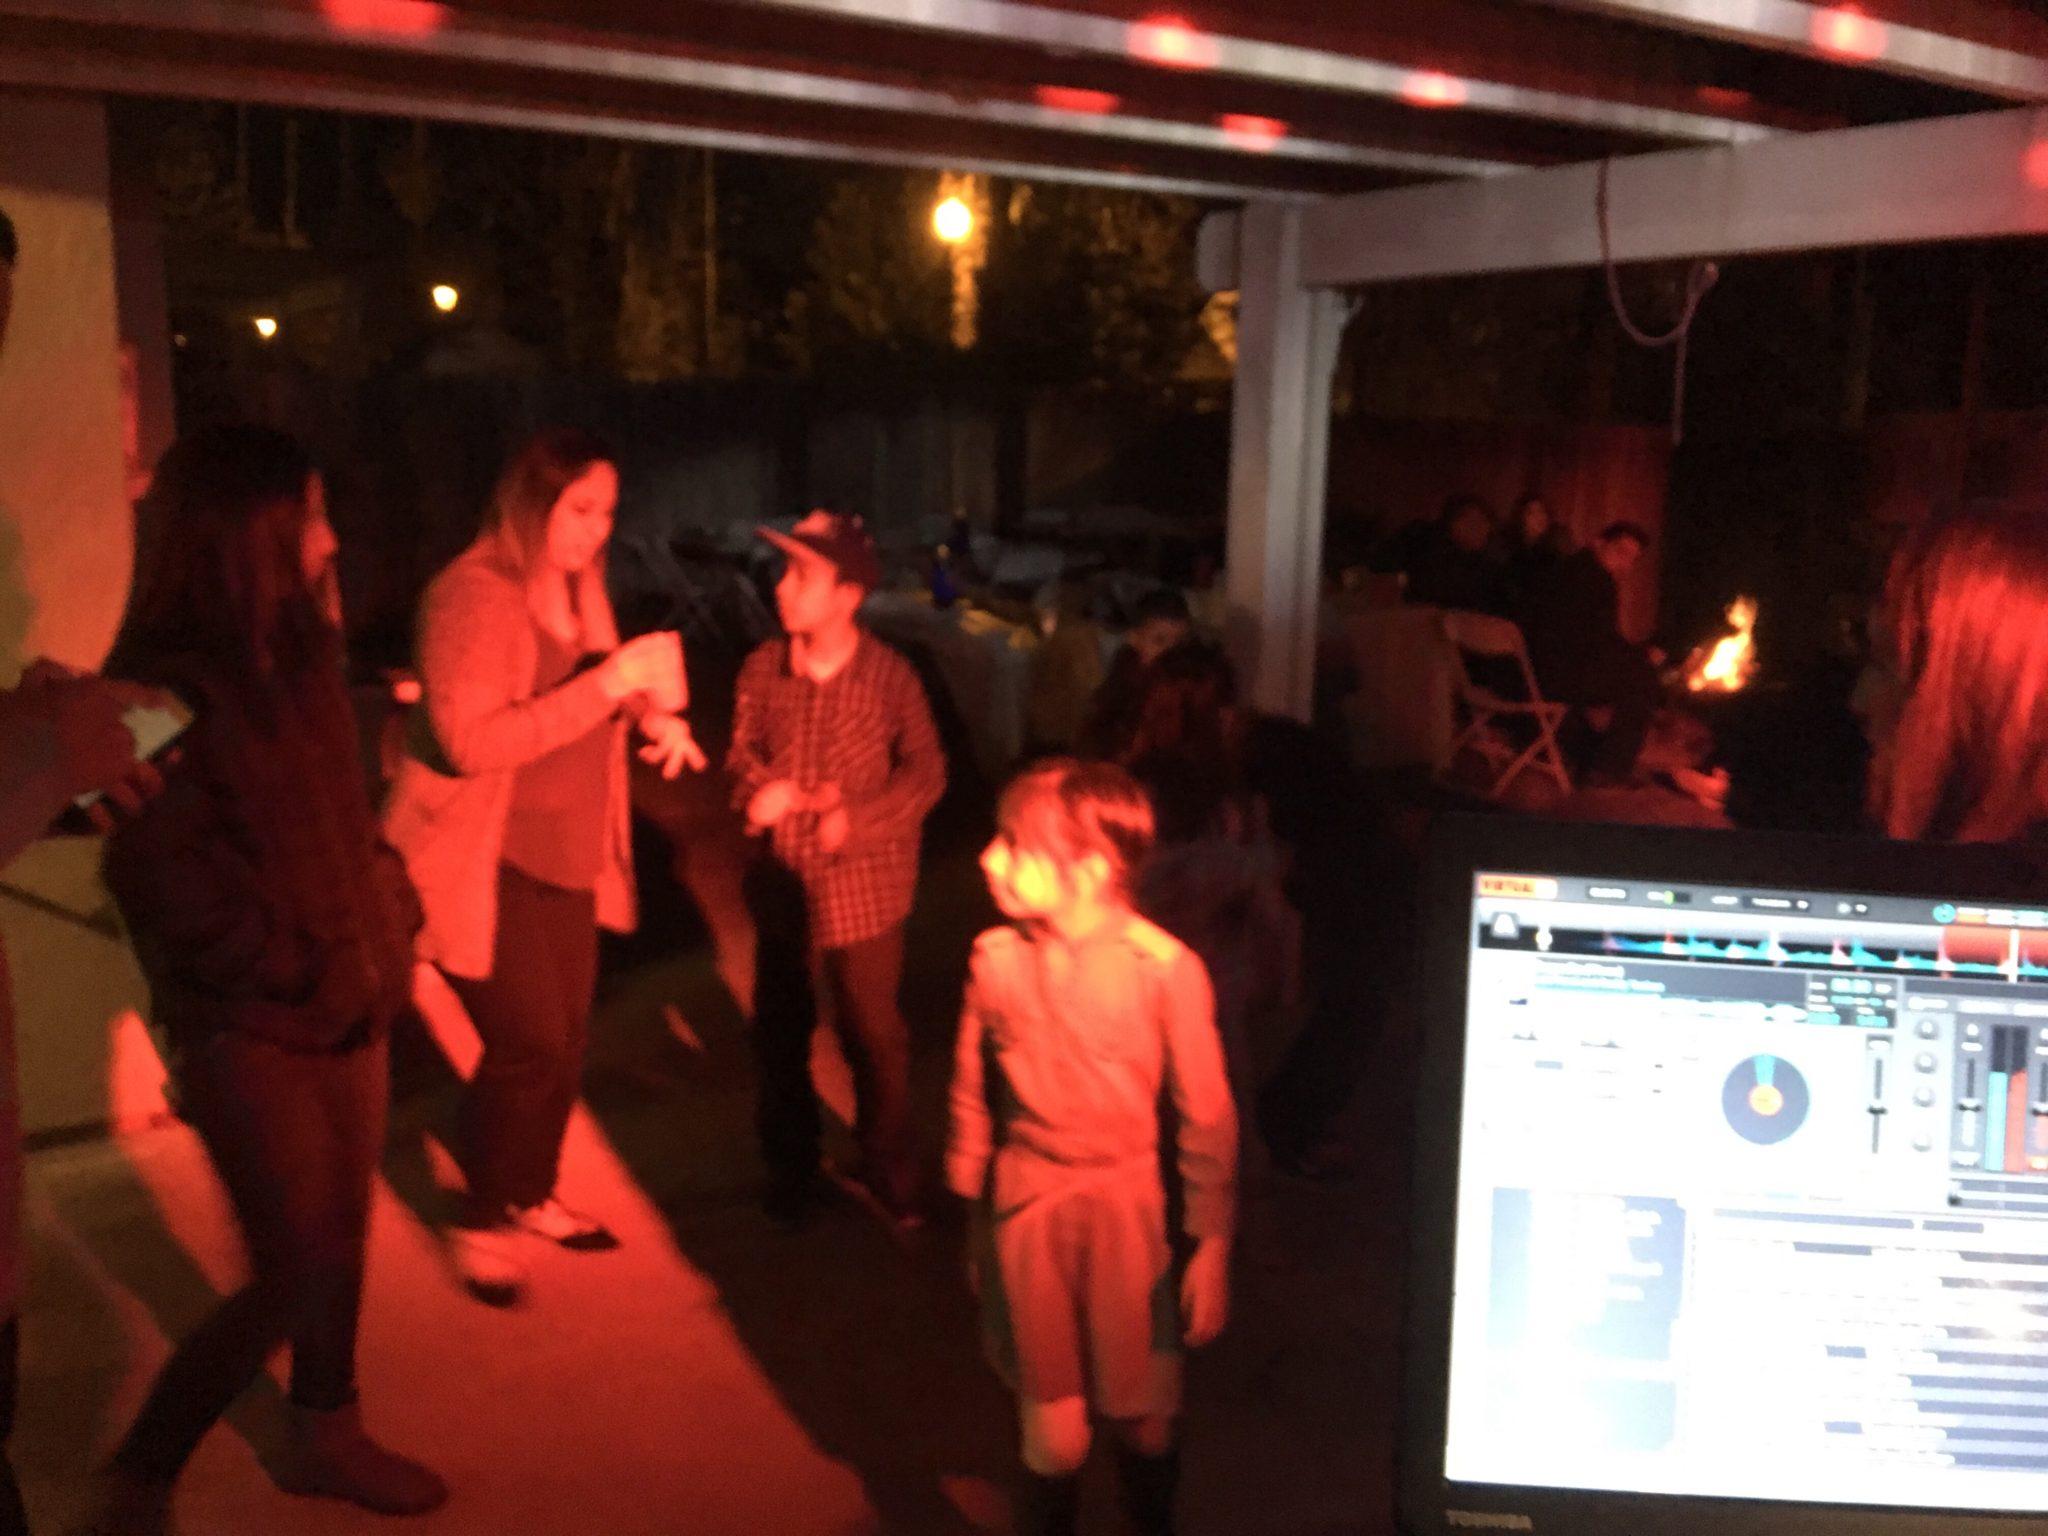 House warming party @ Fontana, CA